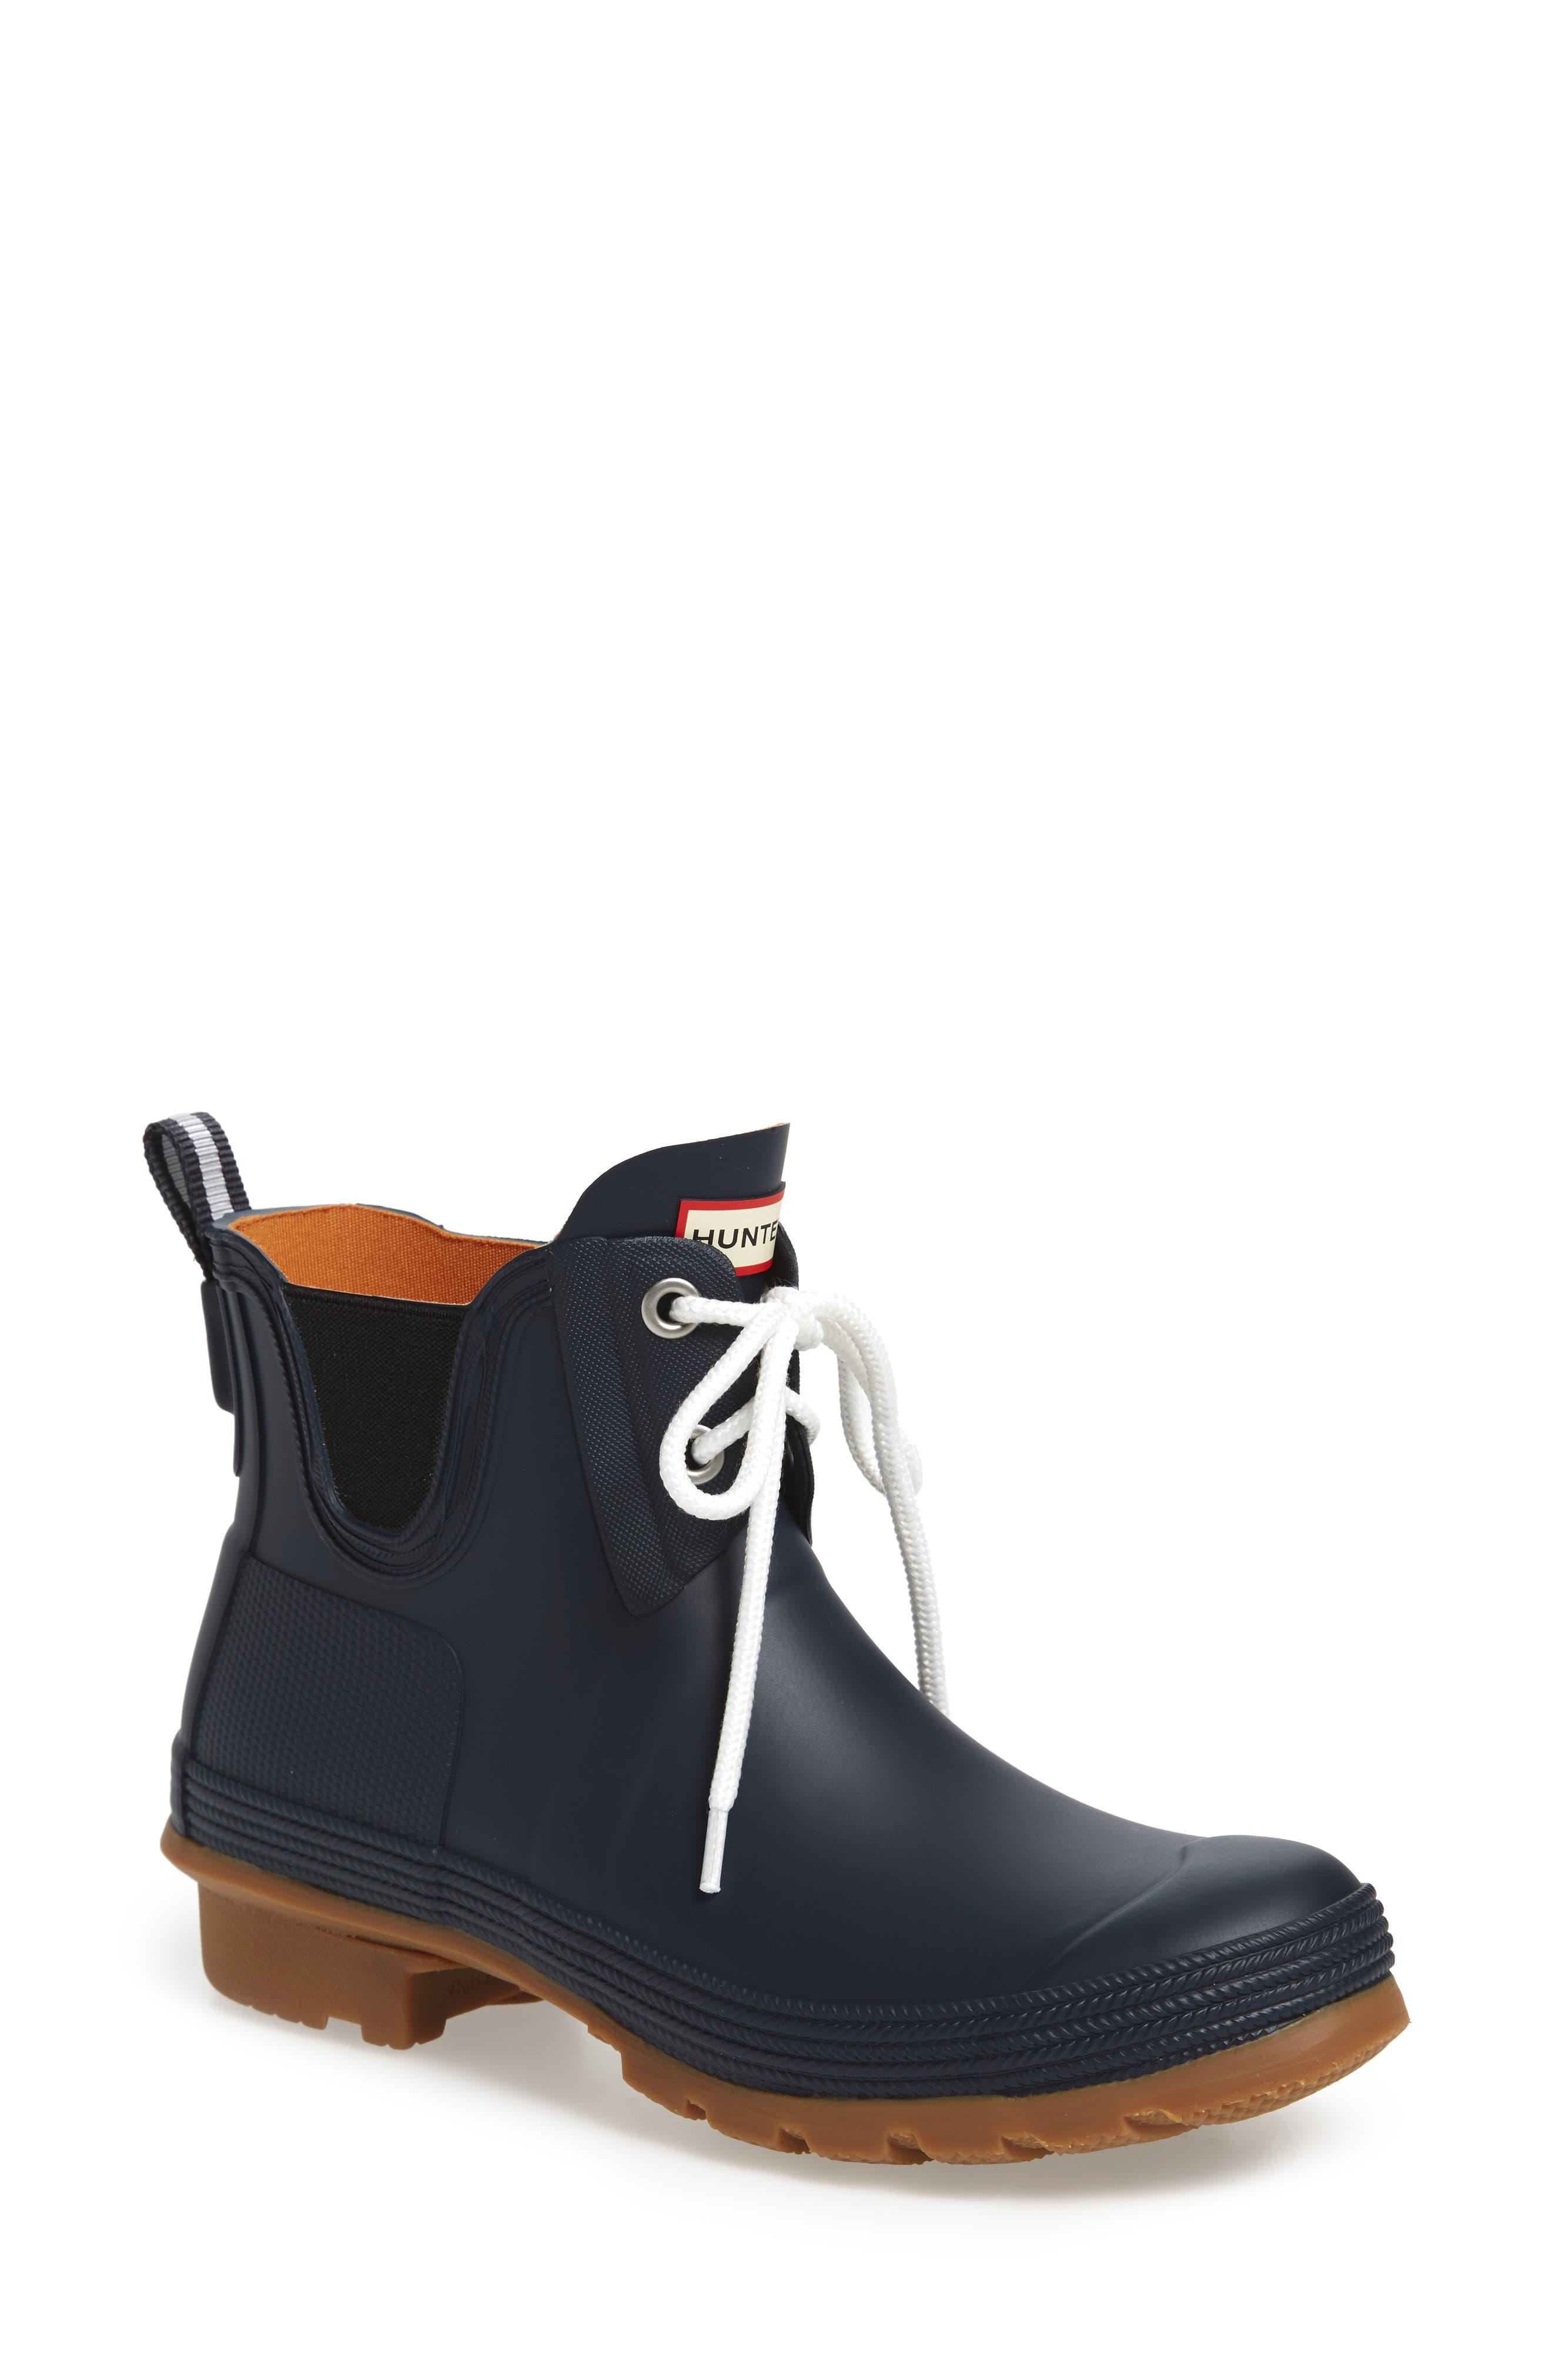 Original Sissinghurst Waterproof Pull-On Boot,                             Main thumbnail 1, color,                             Navy/ Gum